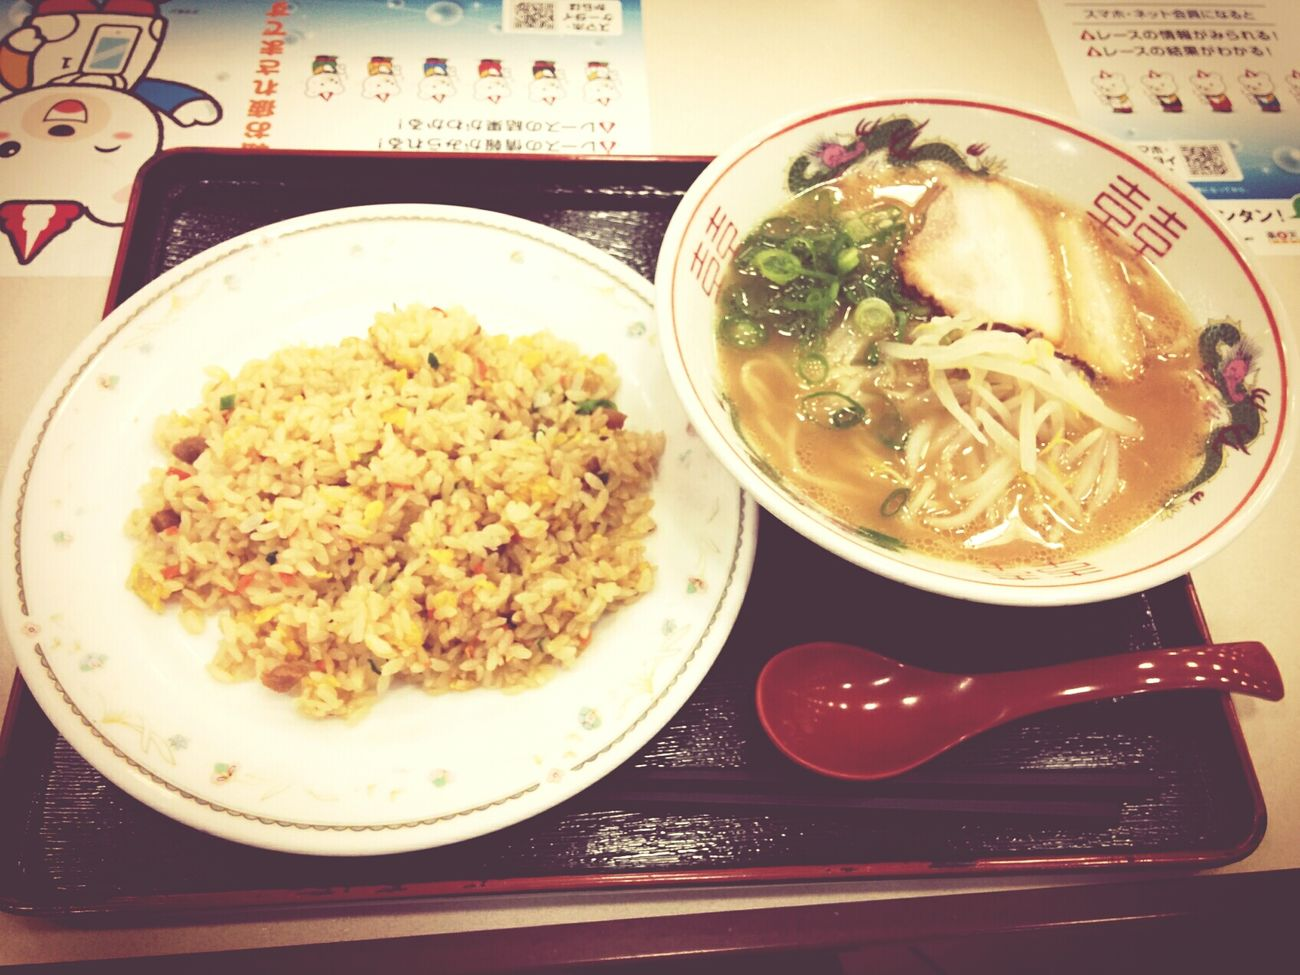 晩飯〜。 Dinner